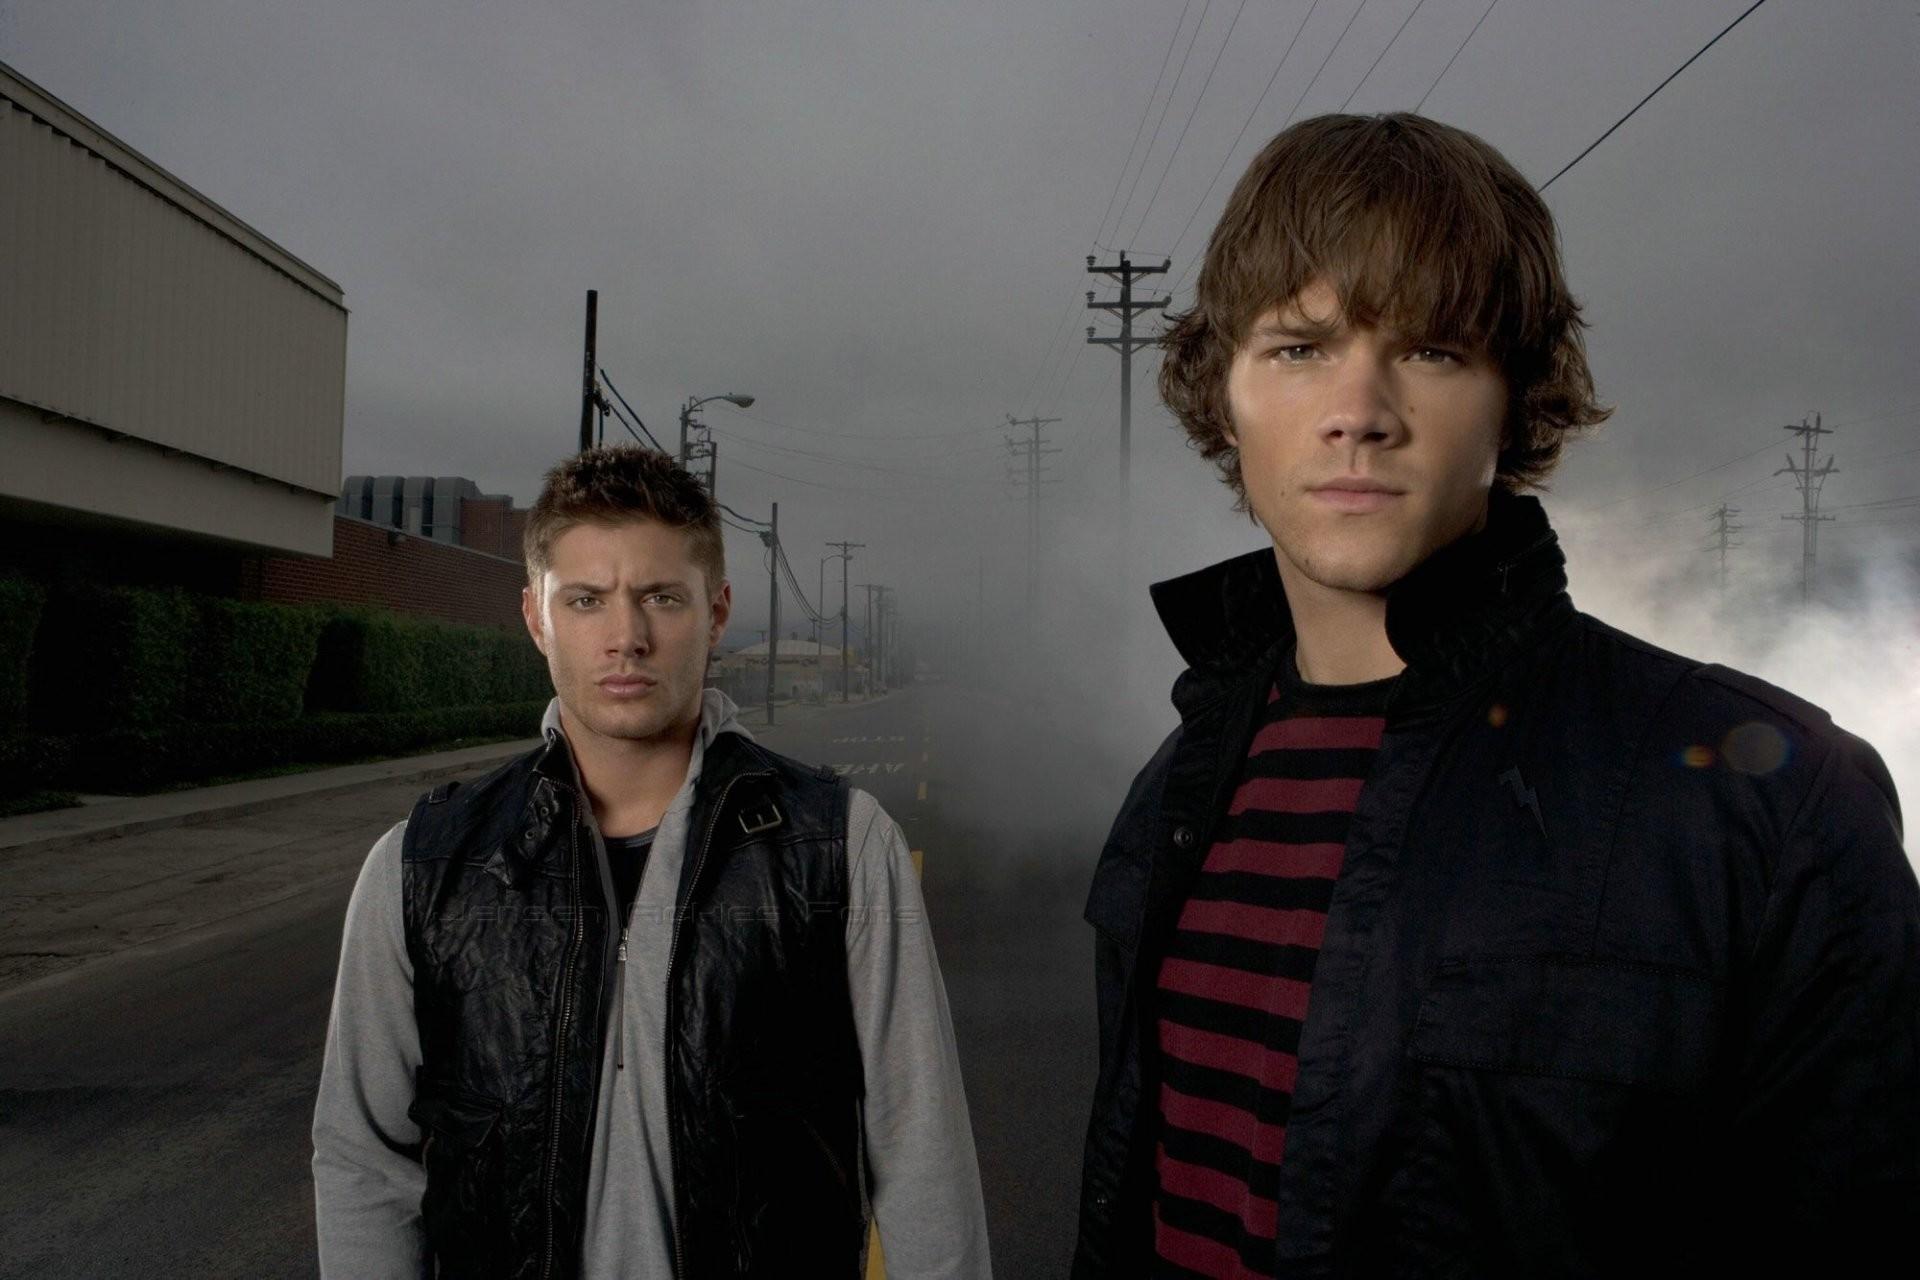 supernatural supernatural jensen ackles dean jensen ackles actor dean  winchester dean winchester winchester brothers jared padalecki